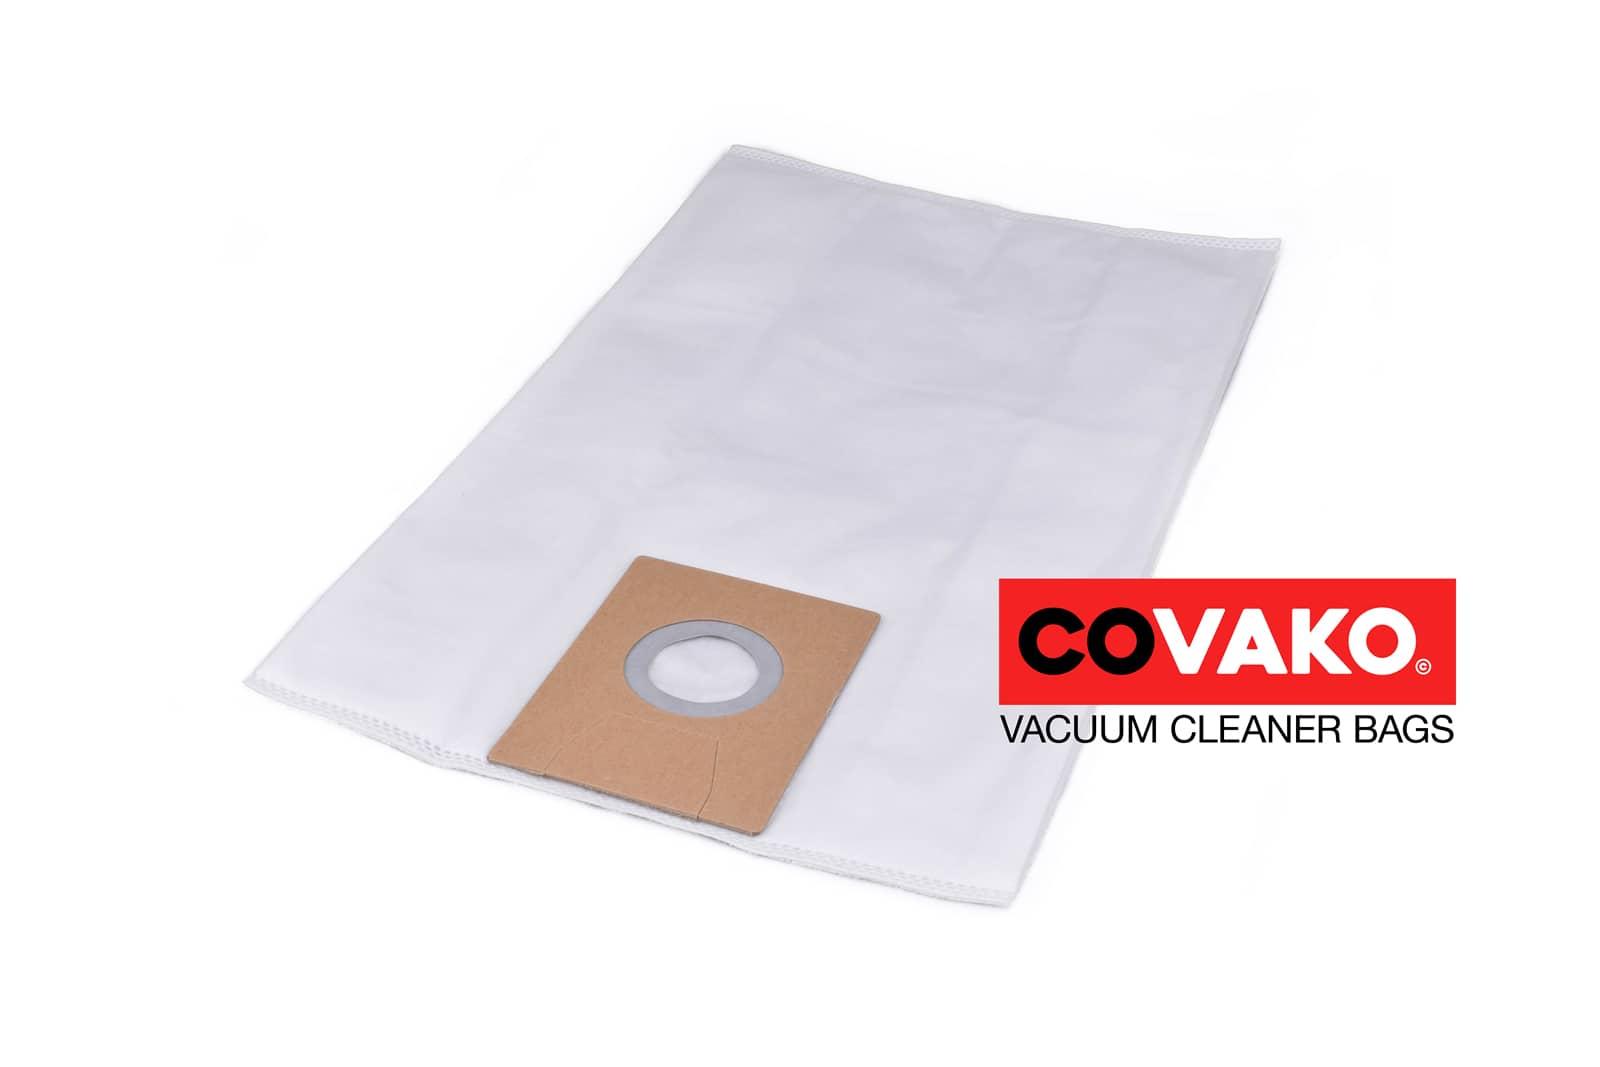 Fast K103200941 / Synthetisch - Fast stofzuigerzakken